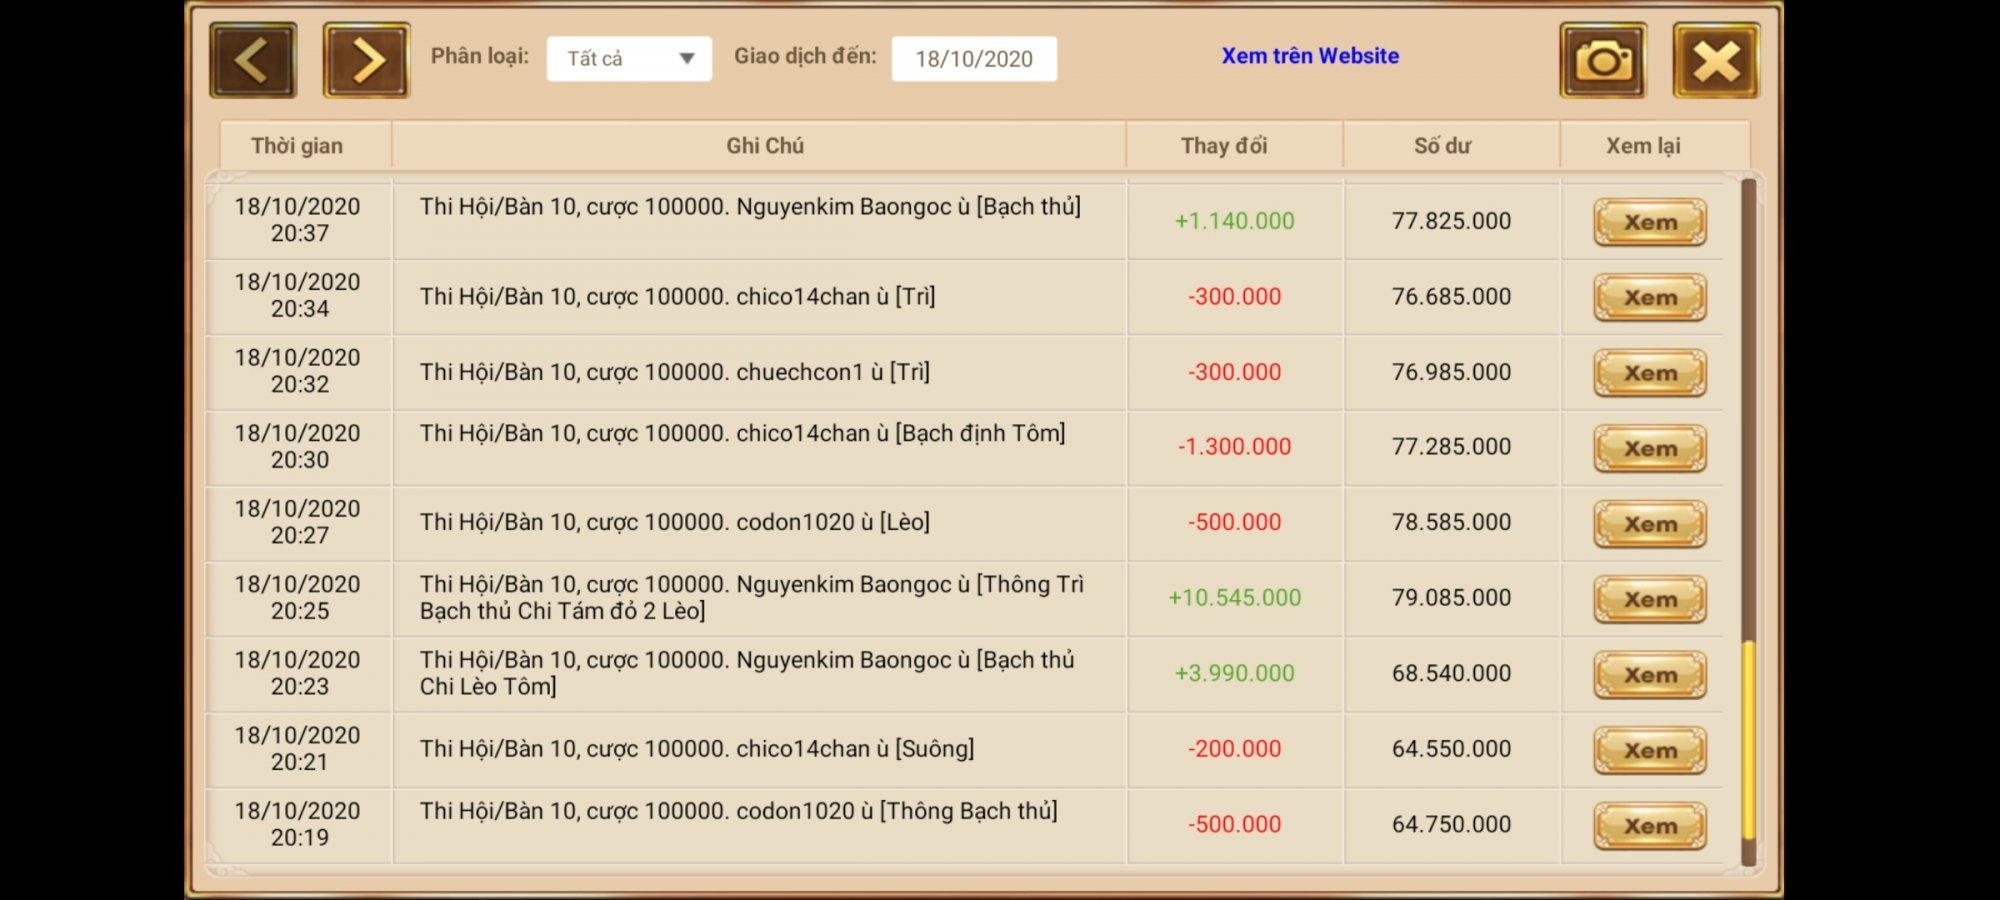 Screenshot_20201018-212701_Chn Sn nh.